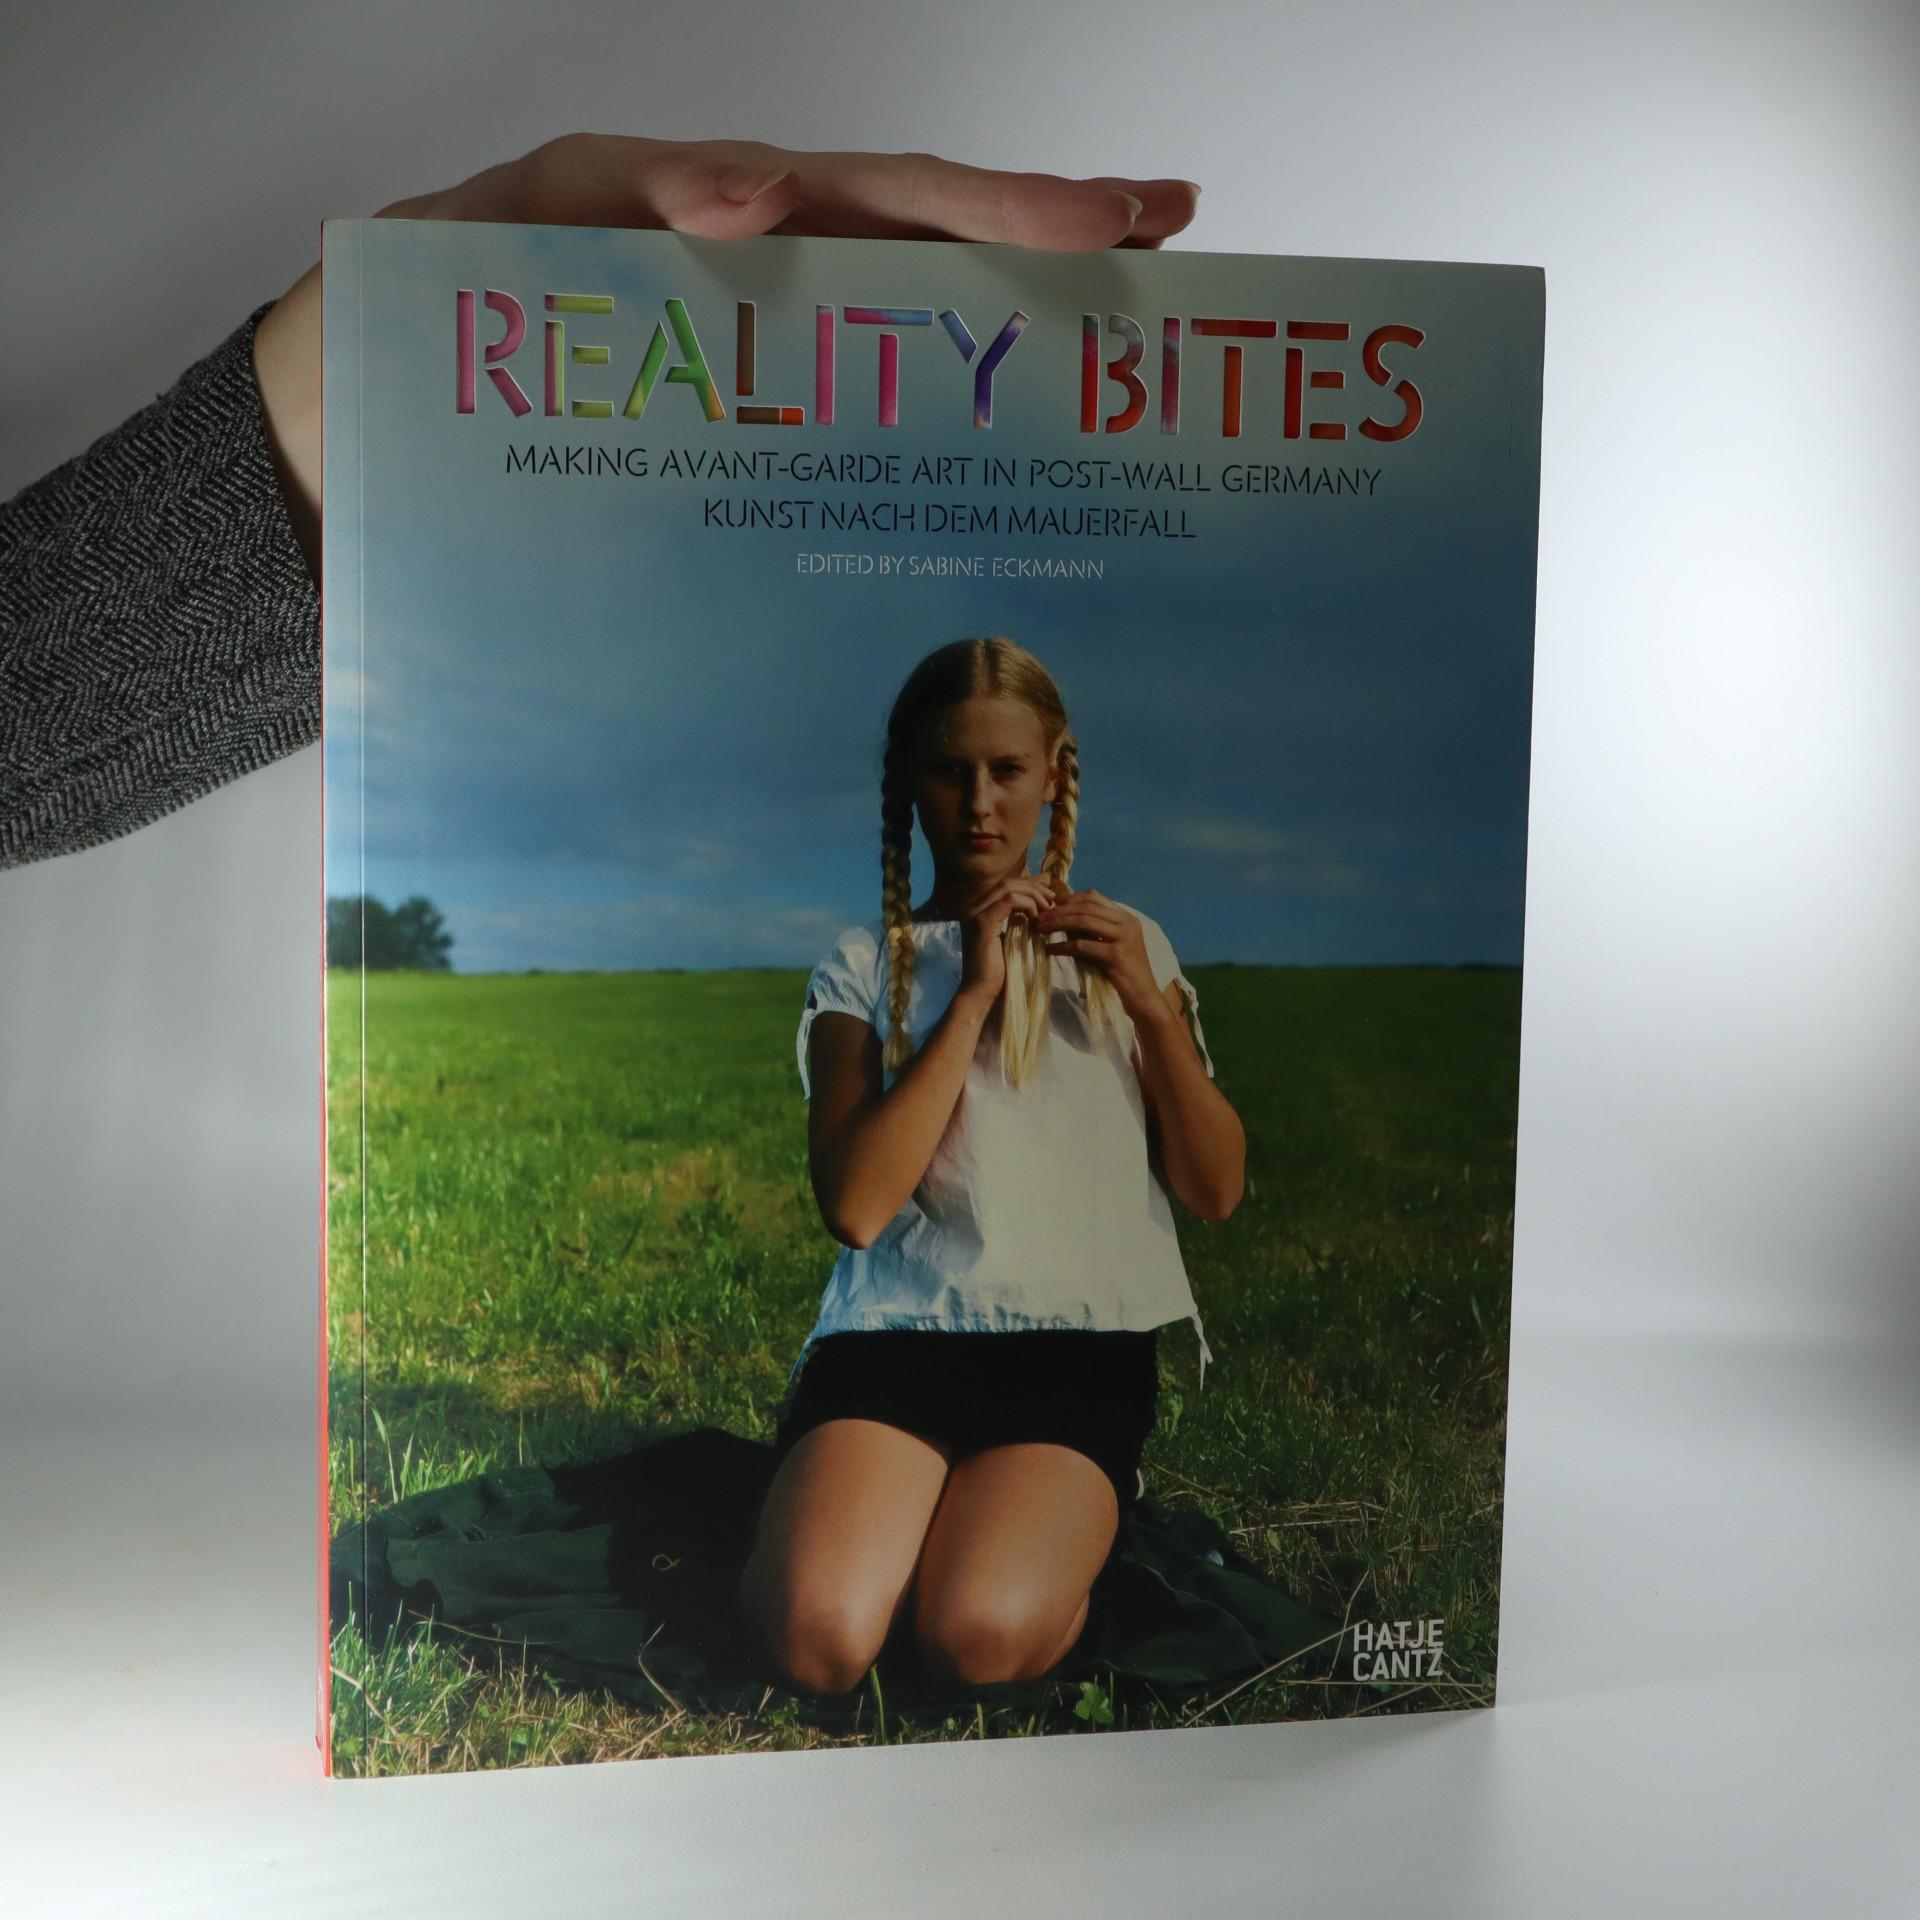 antikvární kniha Reality Bites. Making Avant-garde Art in Post-Wall Germany. Kunst nach dem Mauerfall, 2007